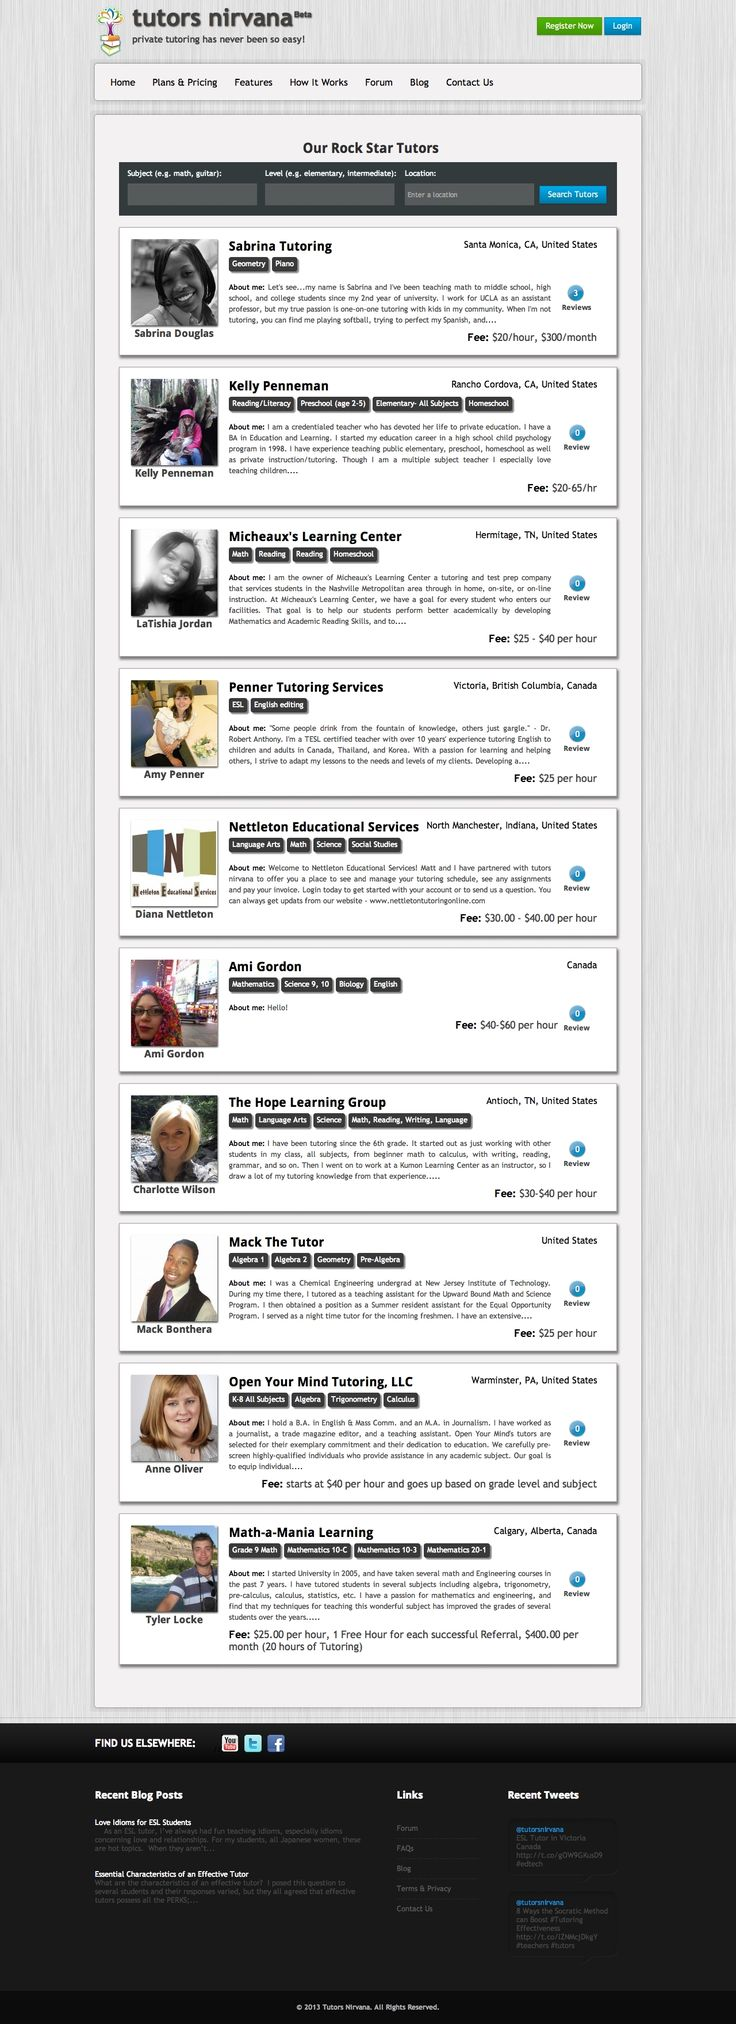 Open Marketplace - List your profile in Tutor Nirvana's searchable database.  http://www.tutorsnirvana.com/search_tutors